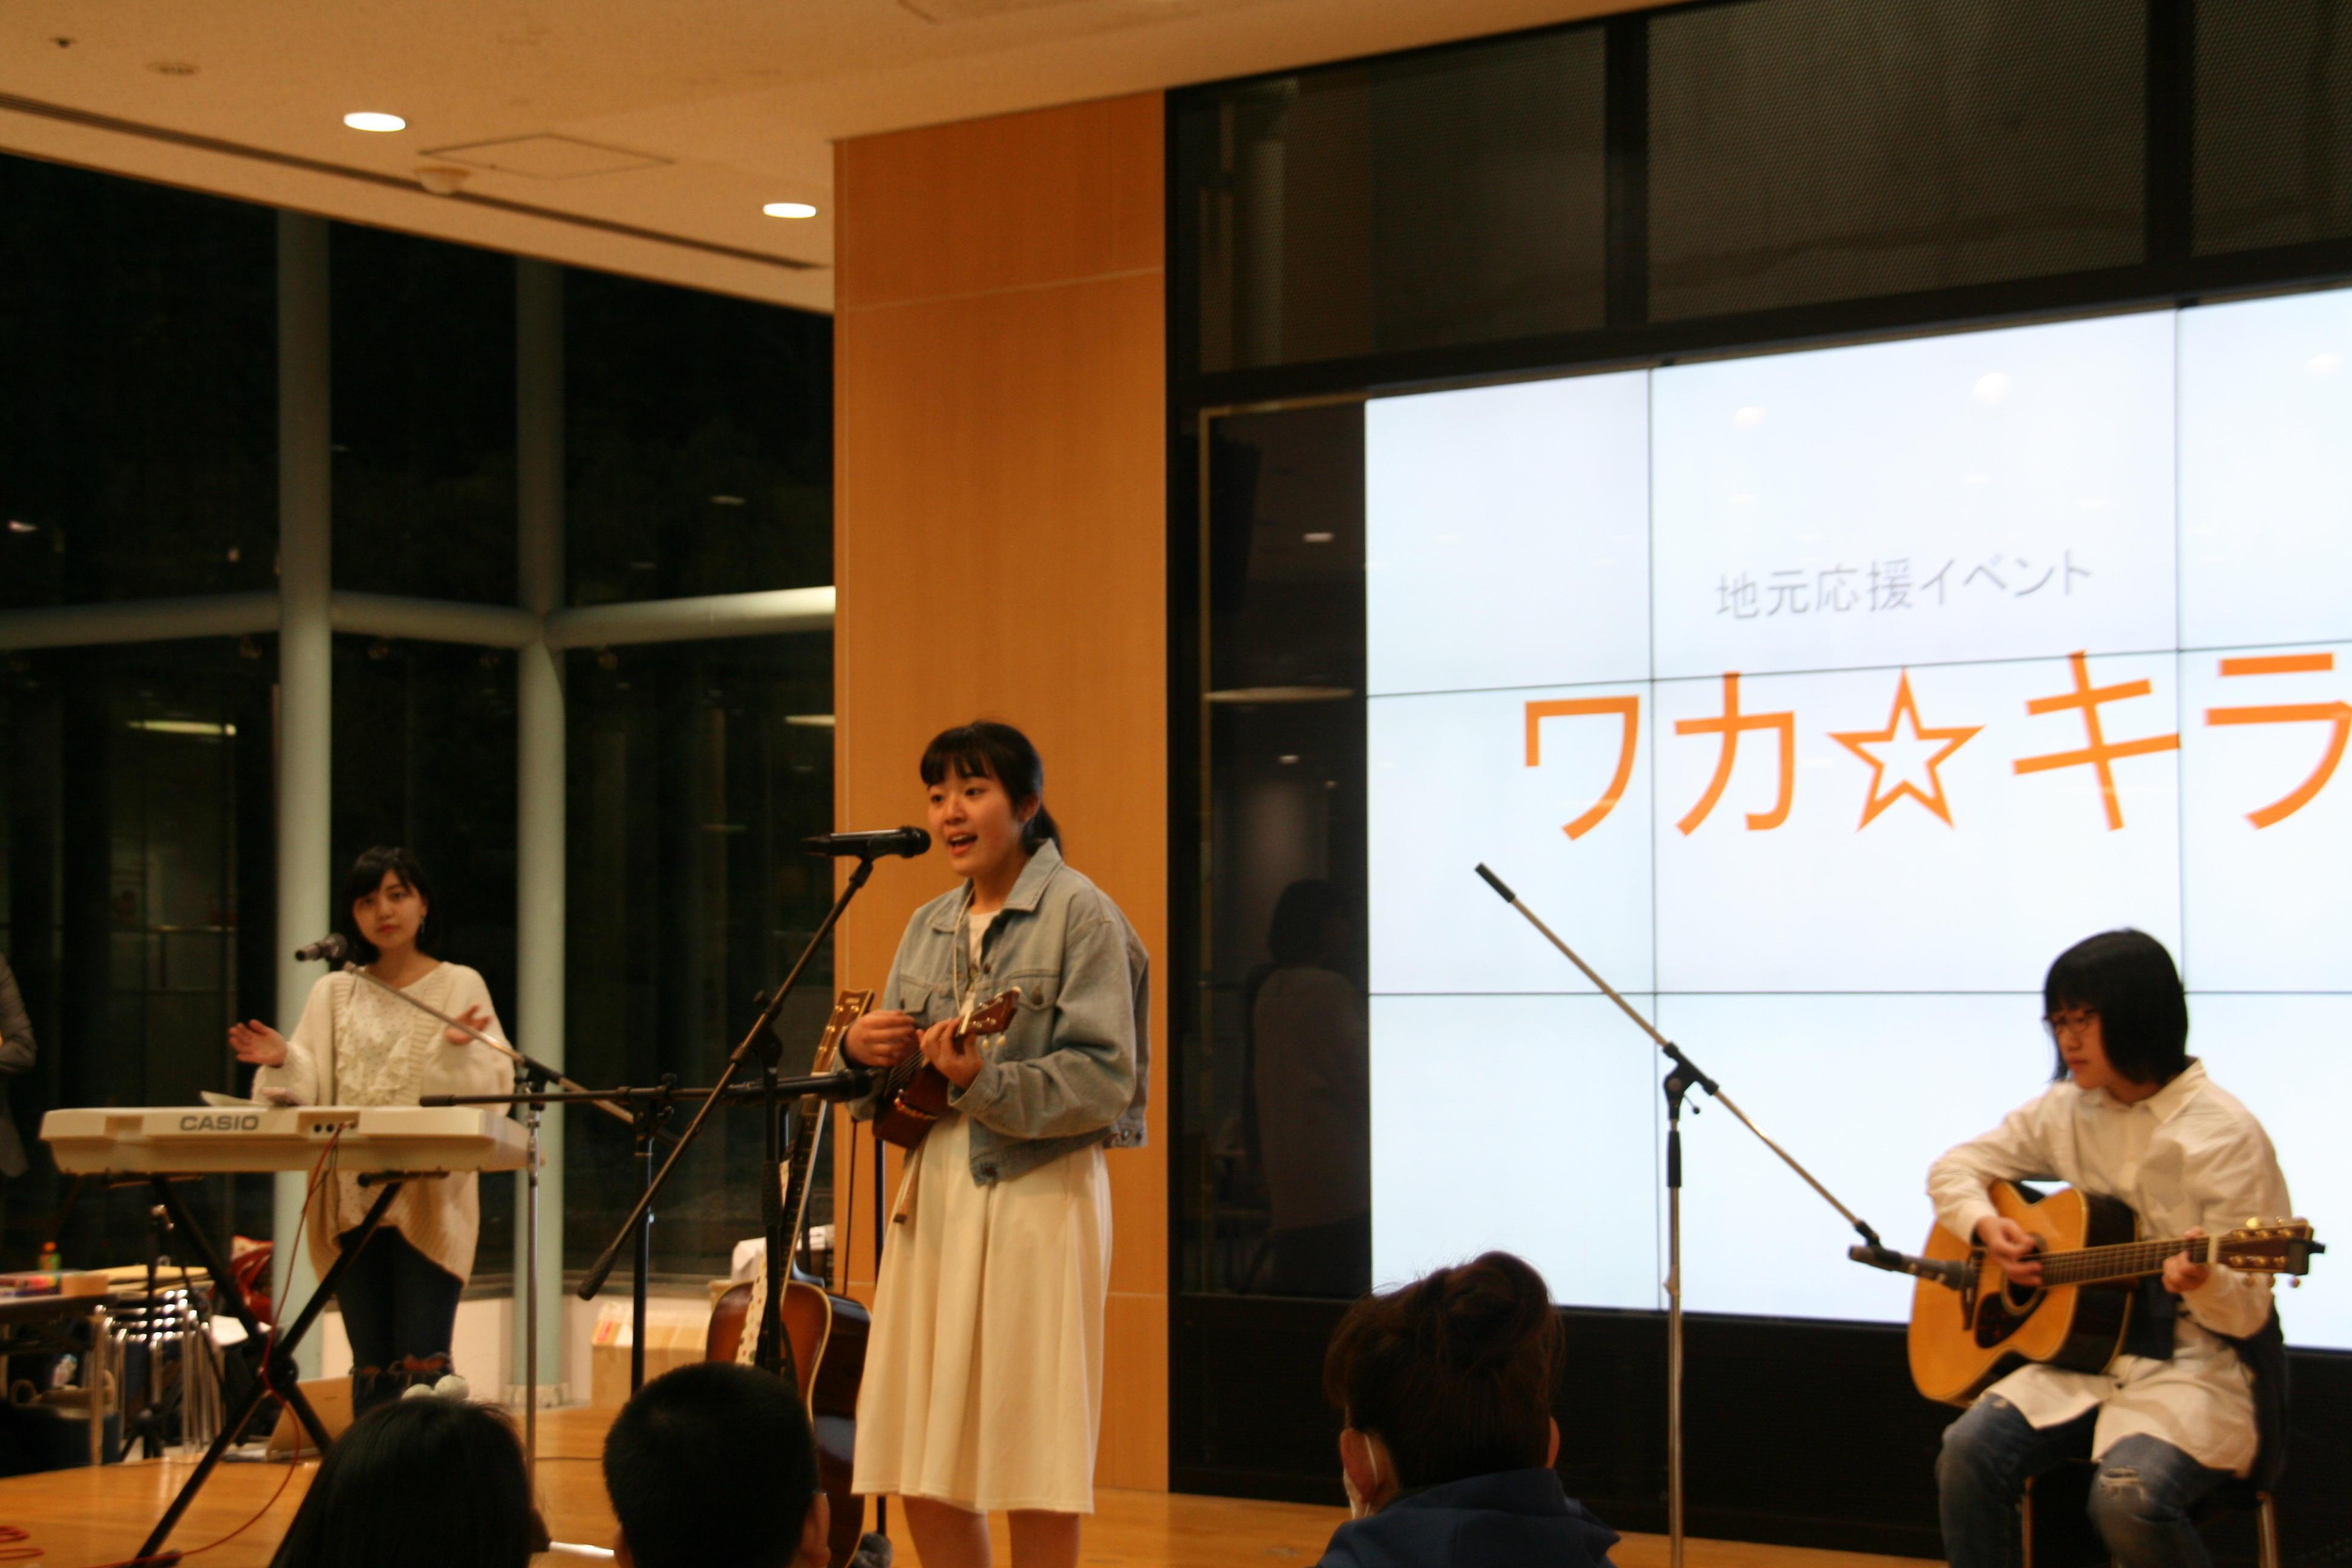 http://news.yoshimoto.co.jp/20180330233701-99dc2f689e3226264836f34a434891af61914bd6.jpg